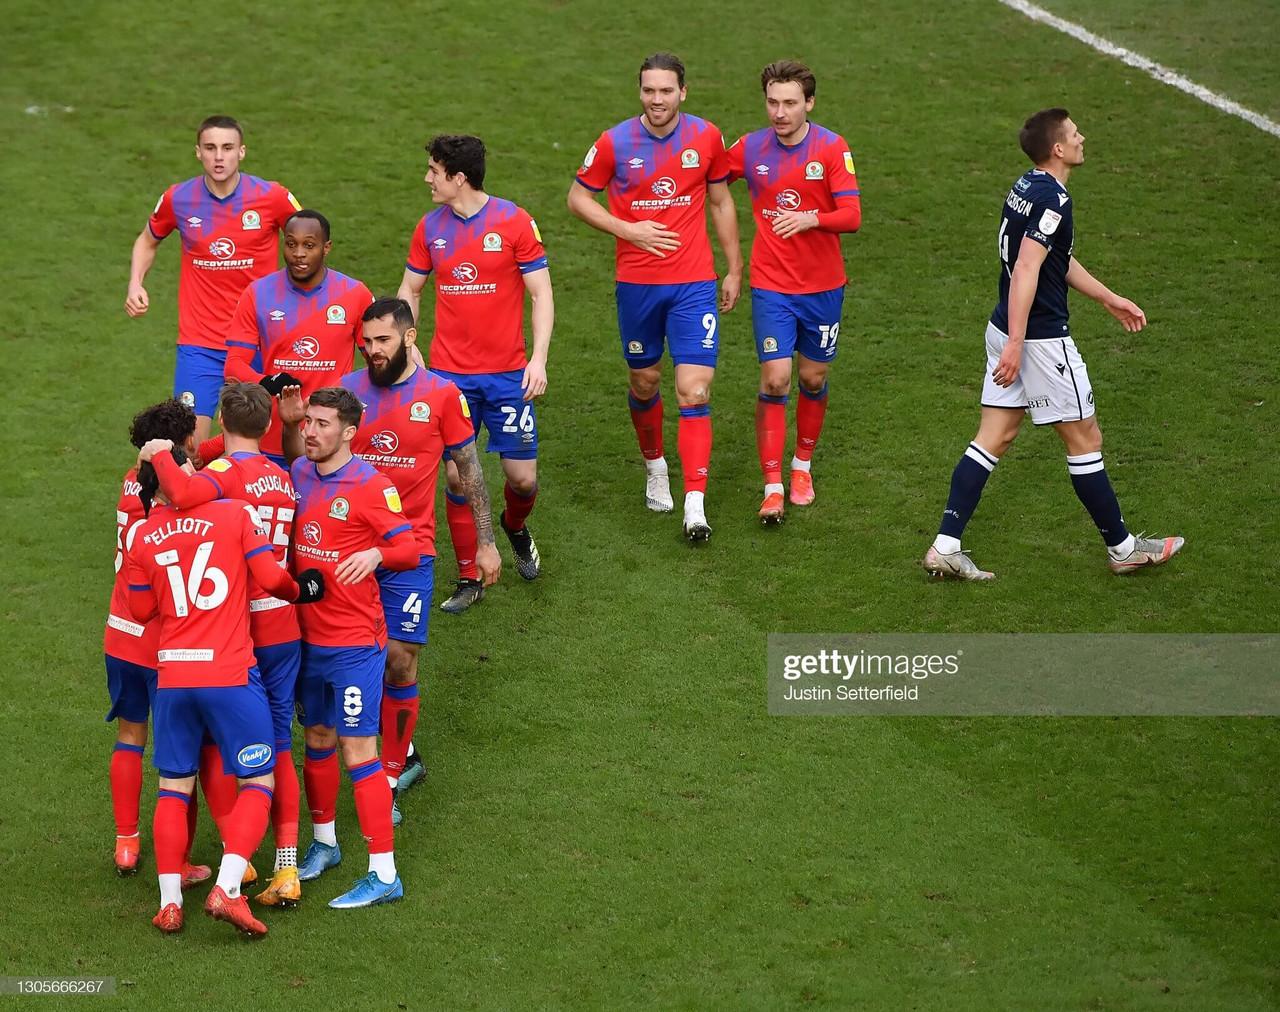 Millwall 0-2 Blackburn Rovers: Dack and Gallagher on target as Blackburn coast past Lions